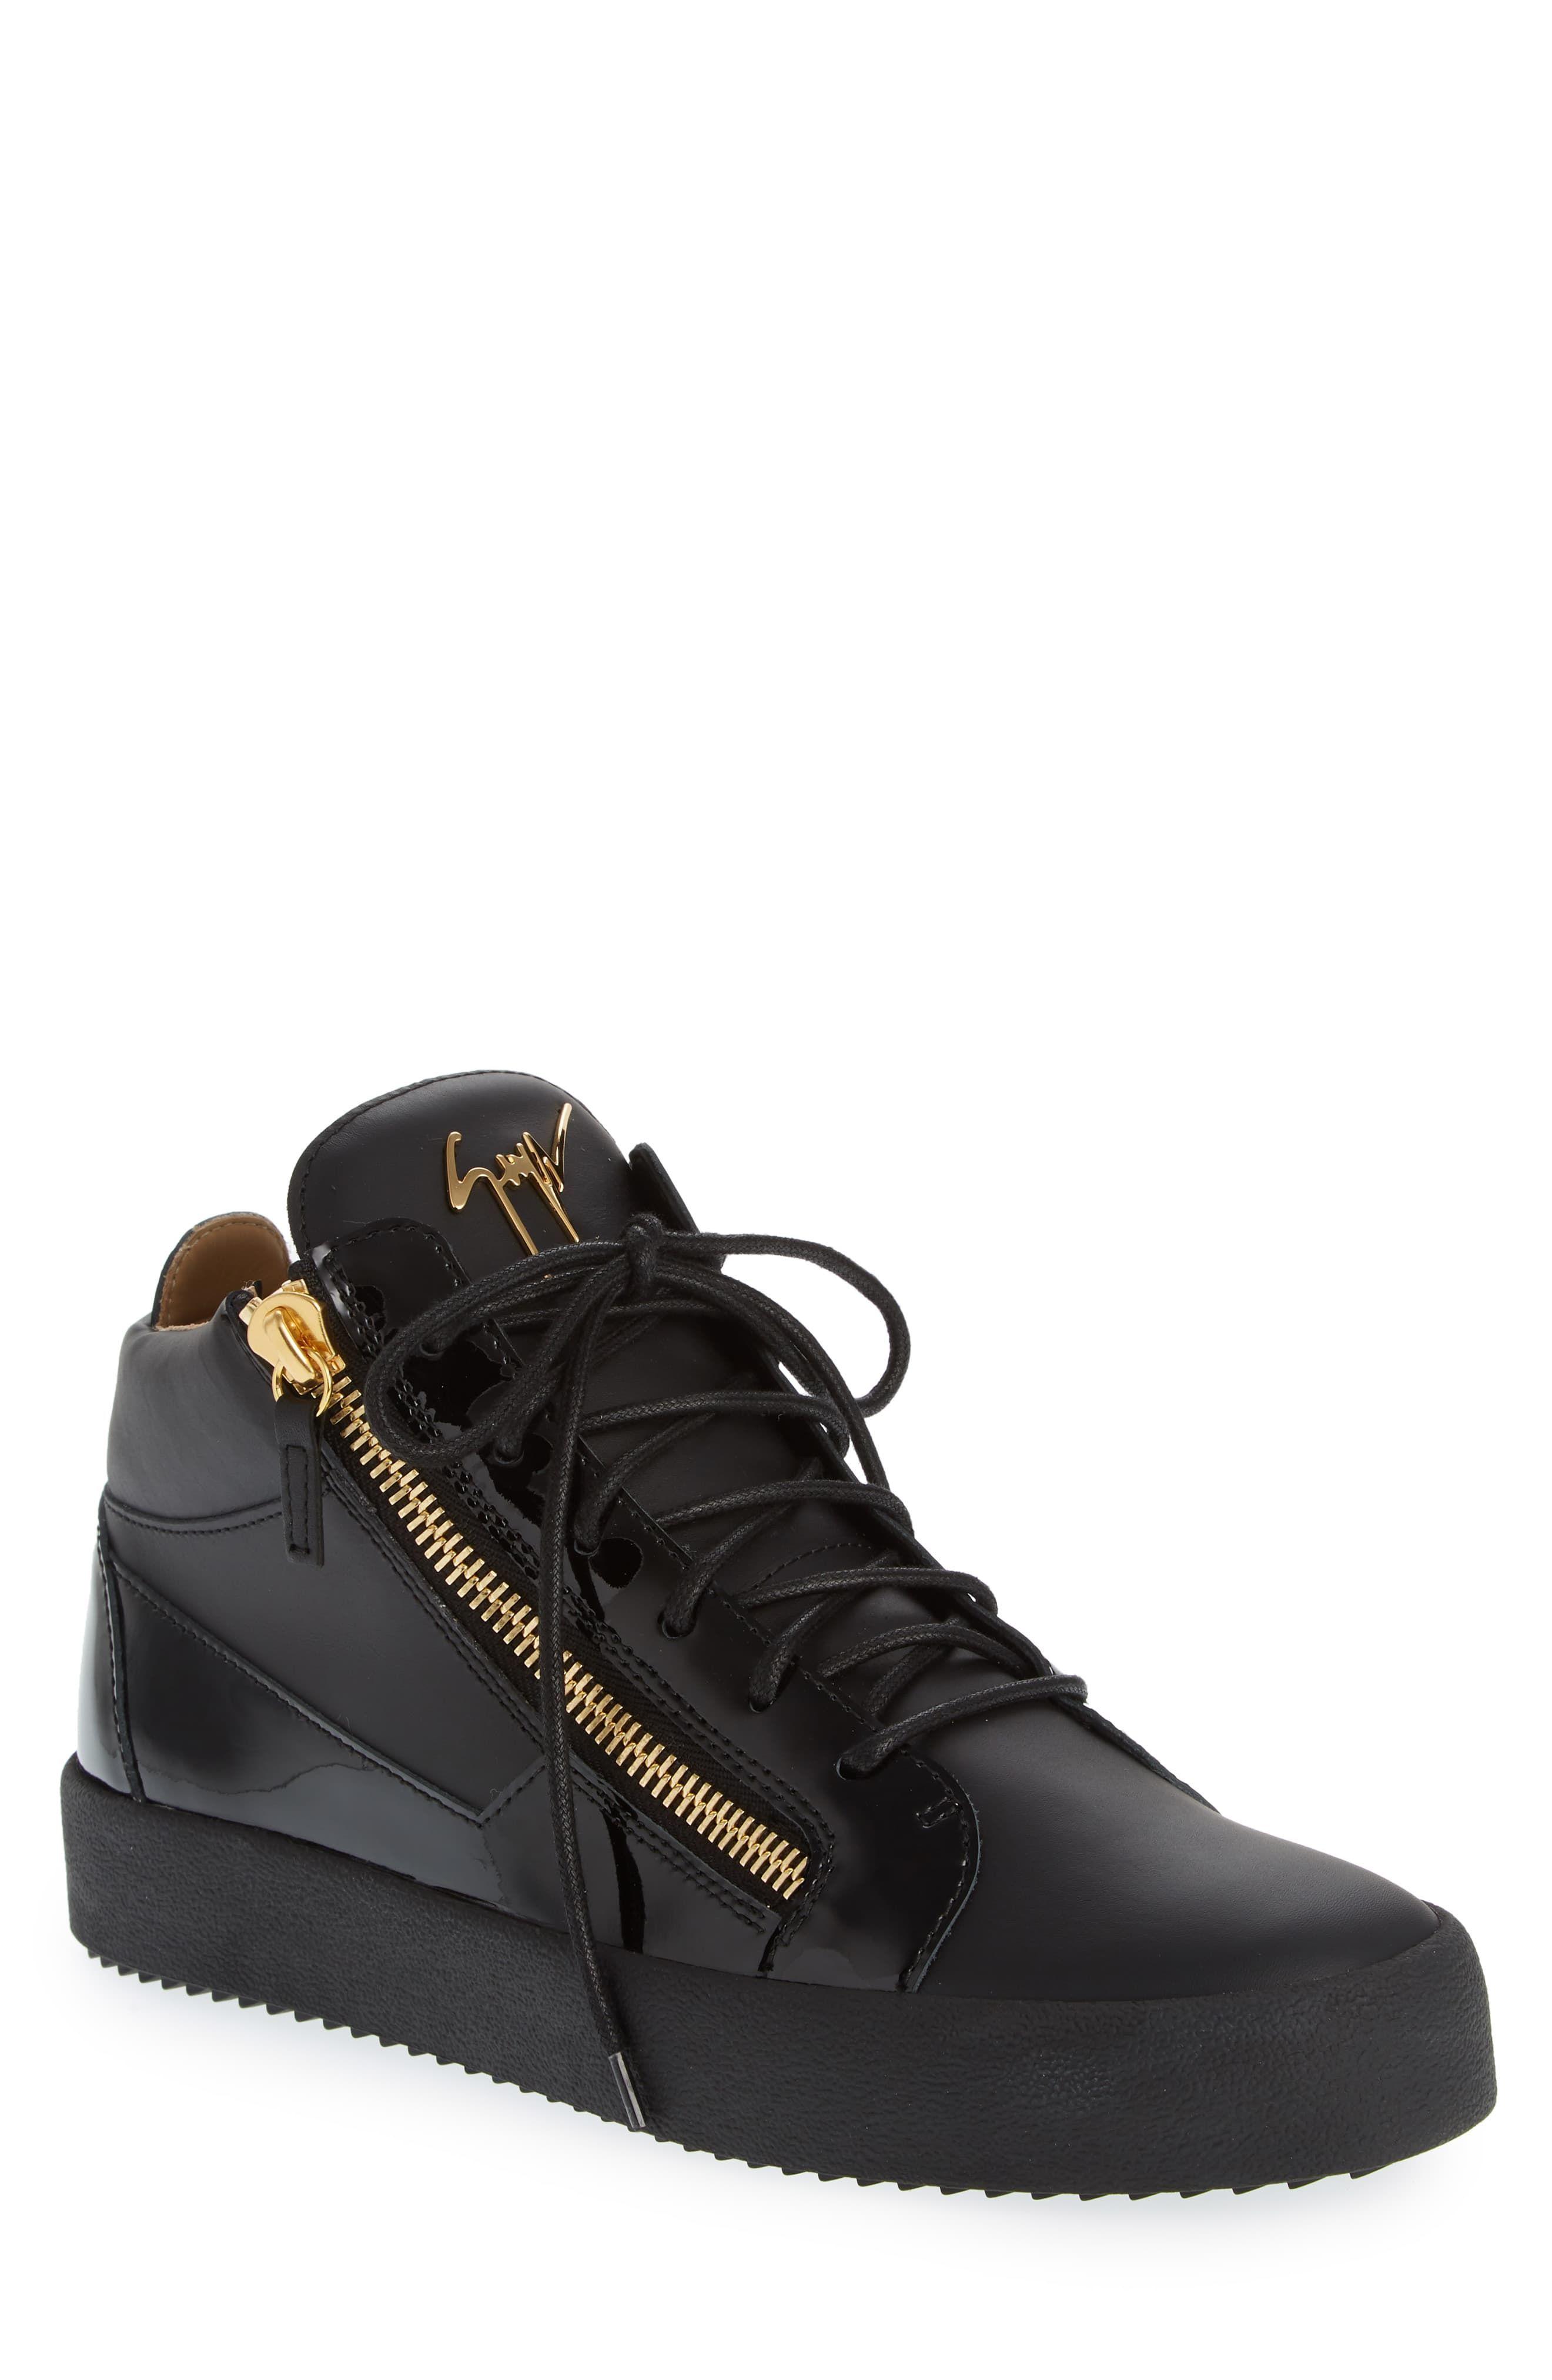 Men's Giuseppe Zanotti Mid Top Sneaker, Size 10US 43EU